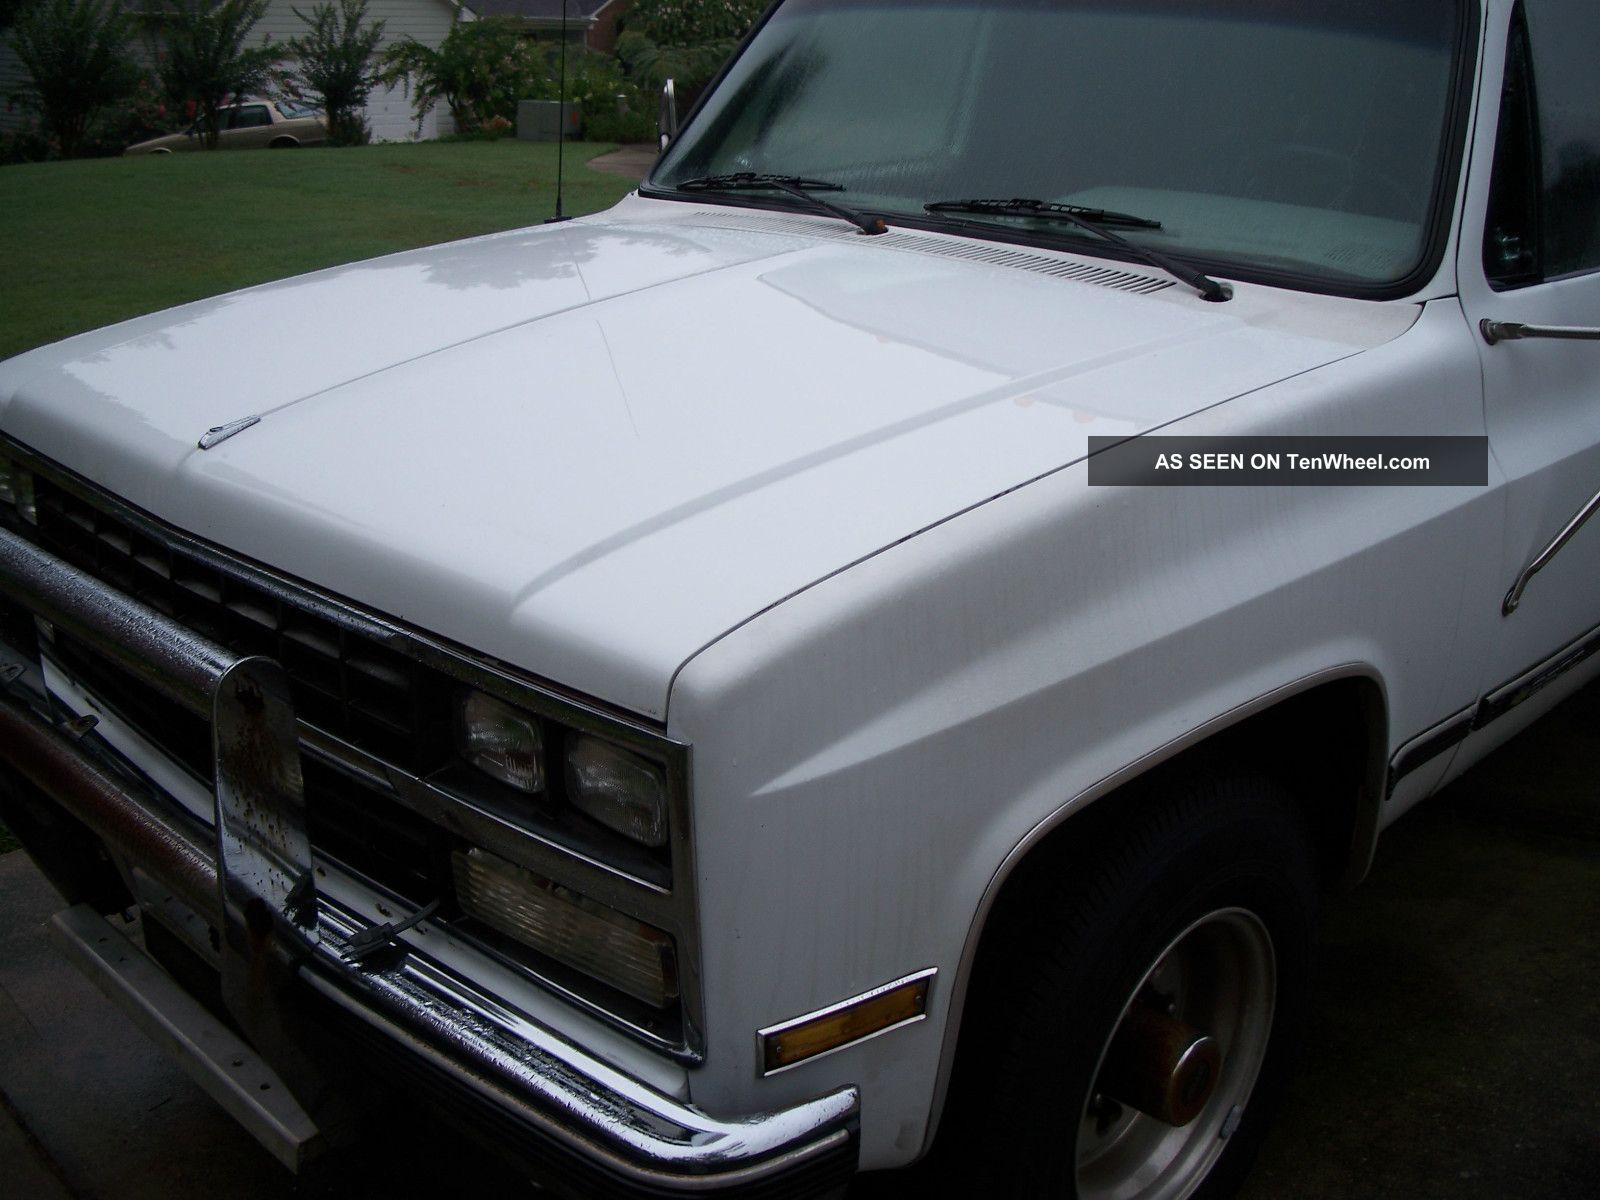 1989 Chevrolet R2500 Suburban Scarb Sport Utility 4 - Door Suburban photo